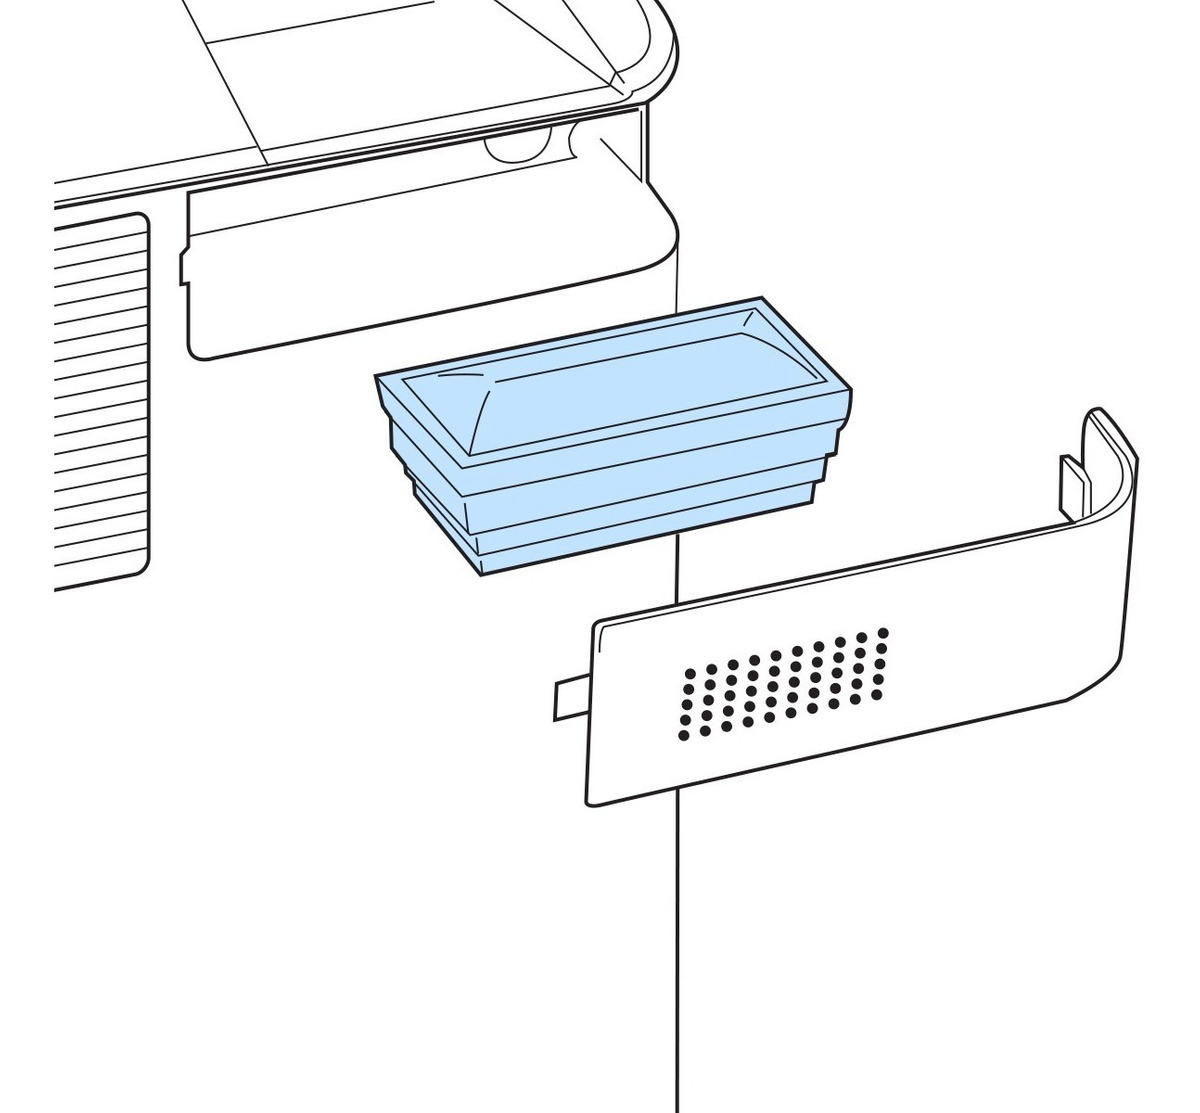 Filtro de Entrada p/ Everflo Philips Respironics